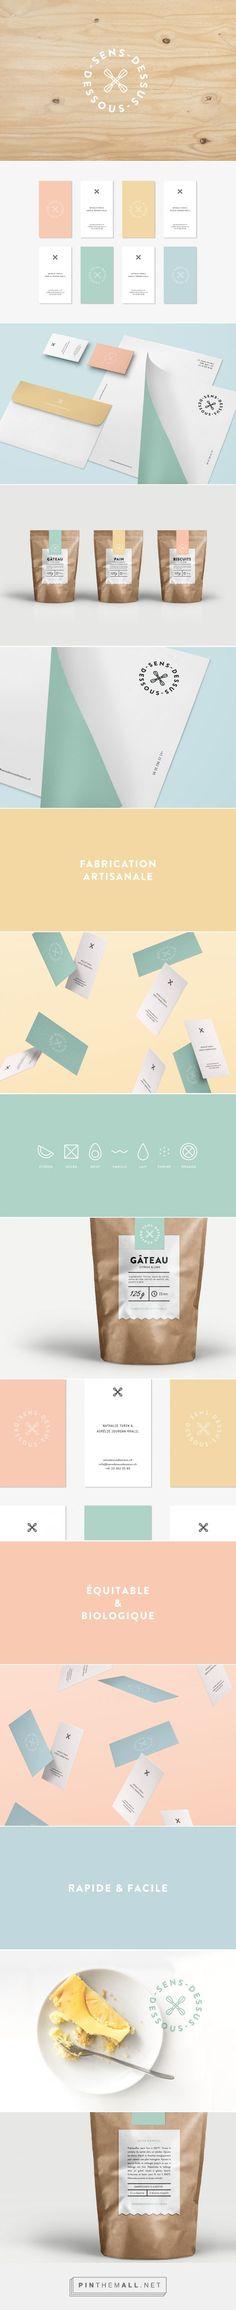 Sens-dessus-dessous on Behance | Fivestar Branding – Design and Branding Agency & Inspiration Gallery Más